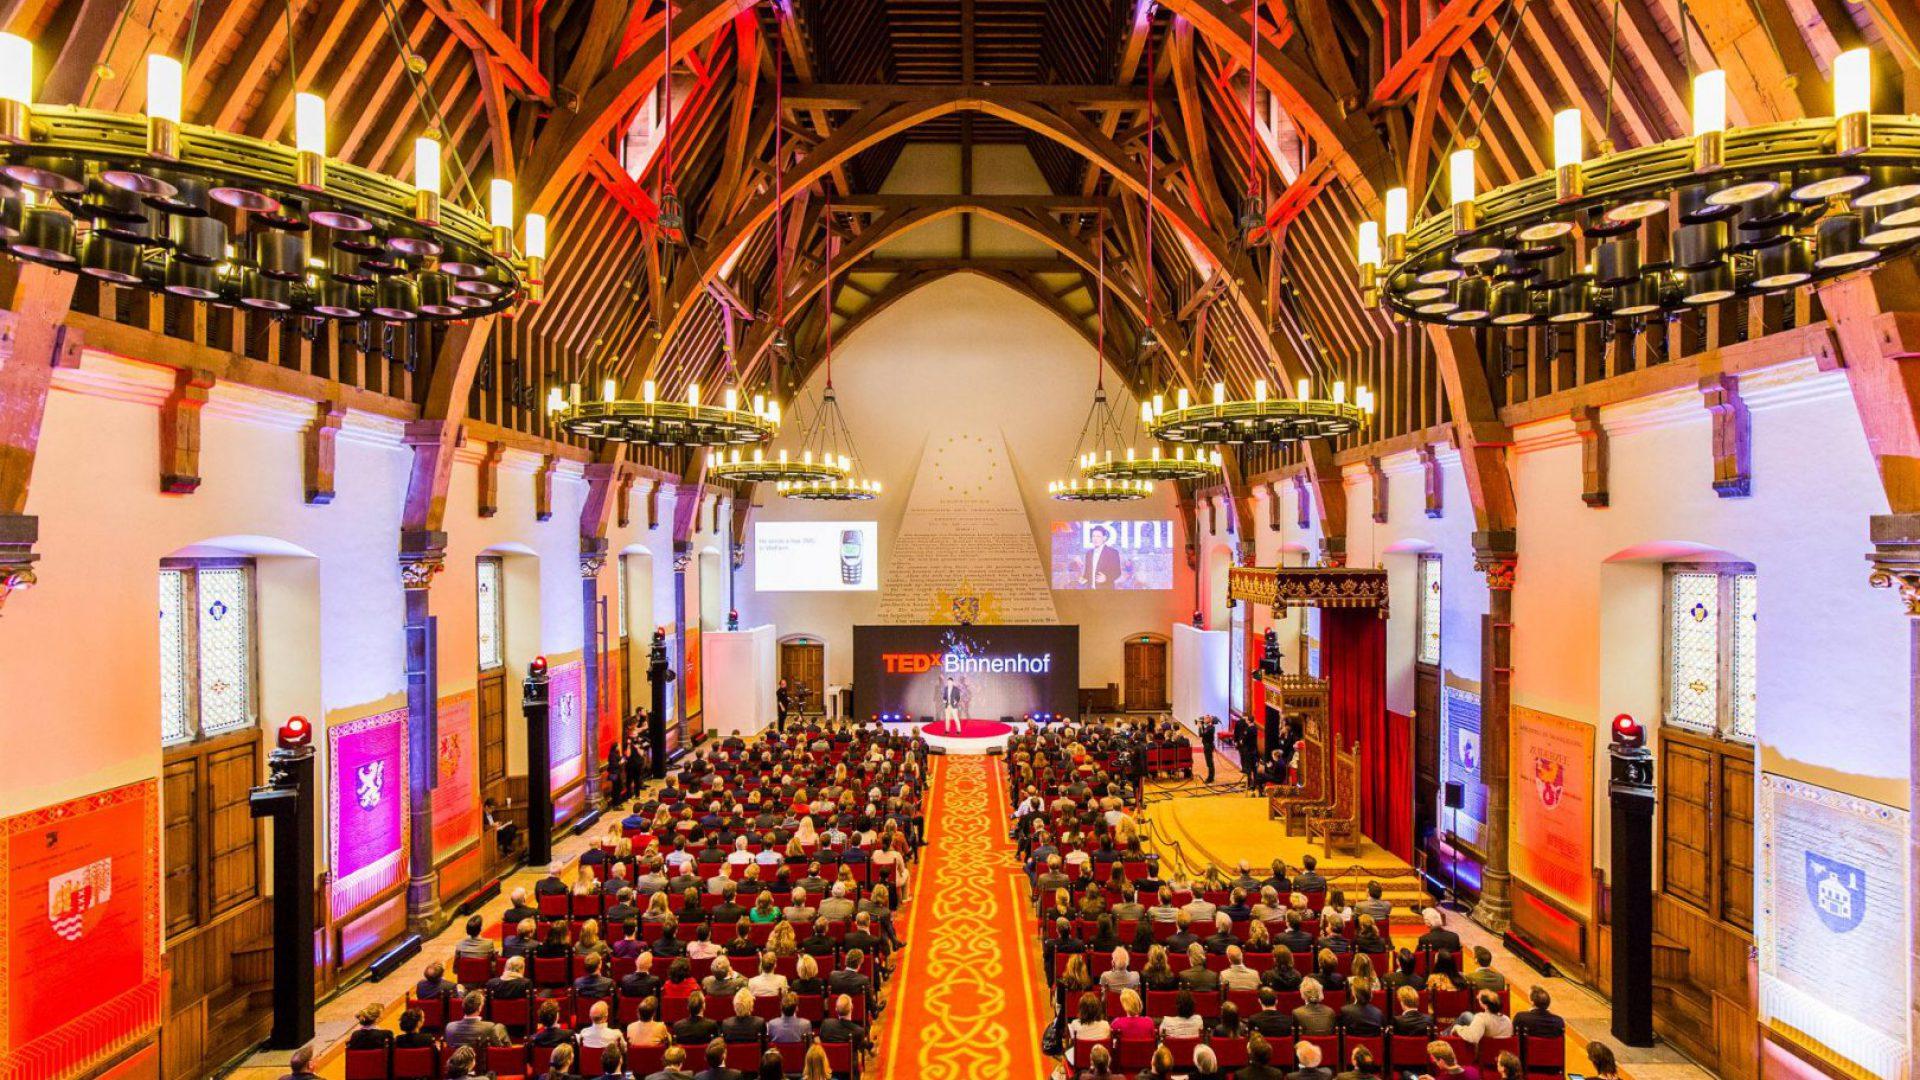 Tedx Europe